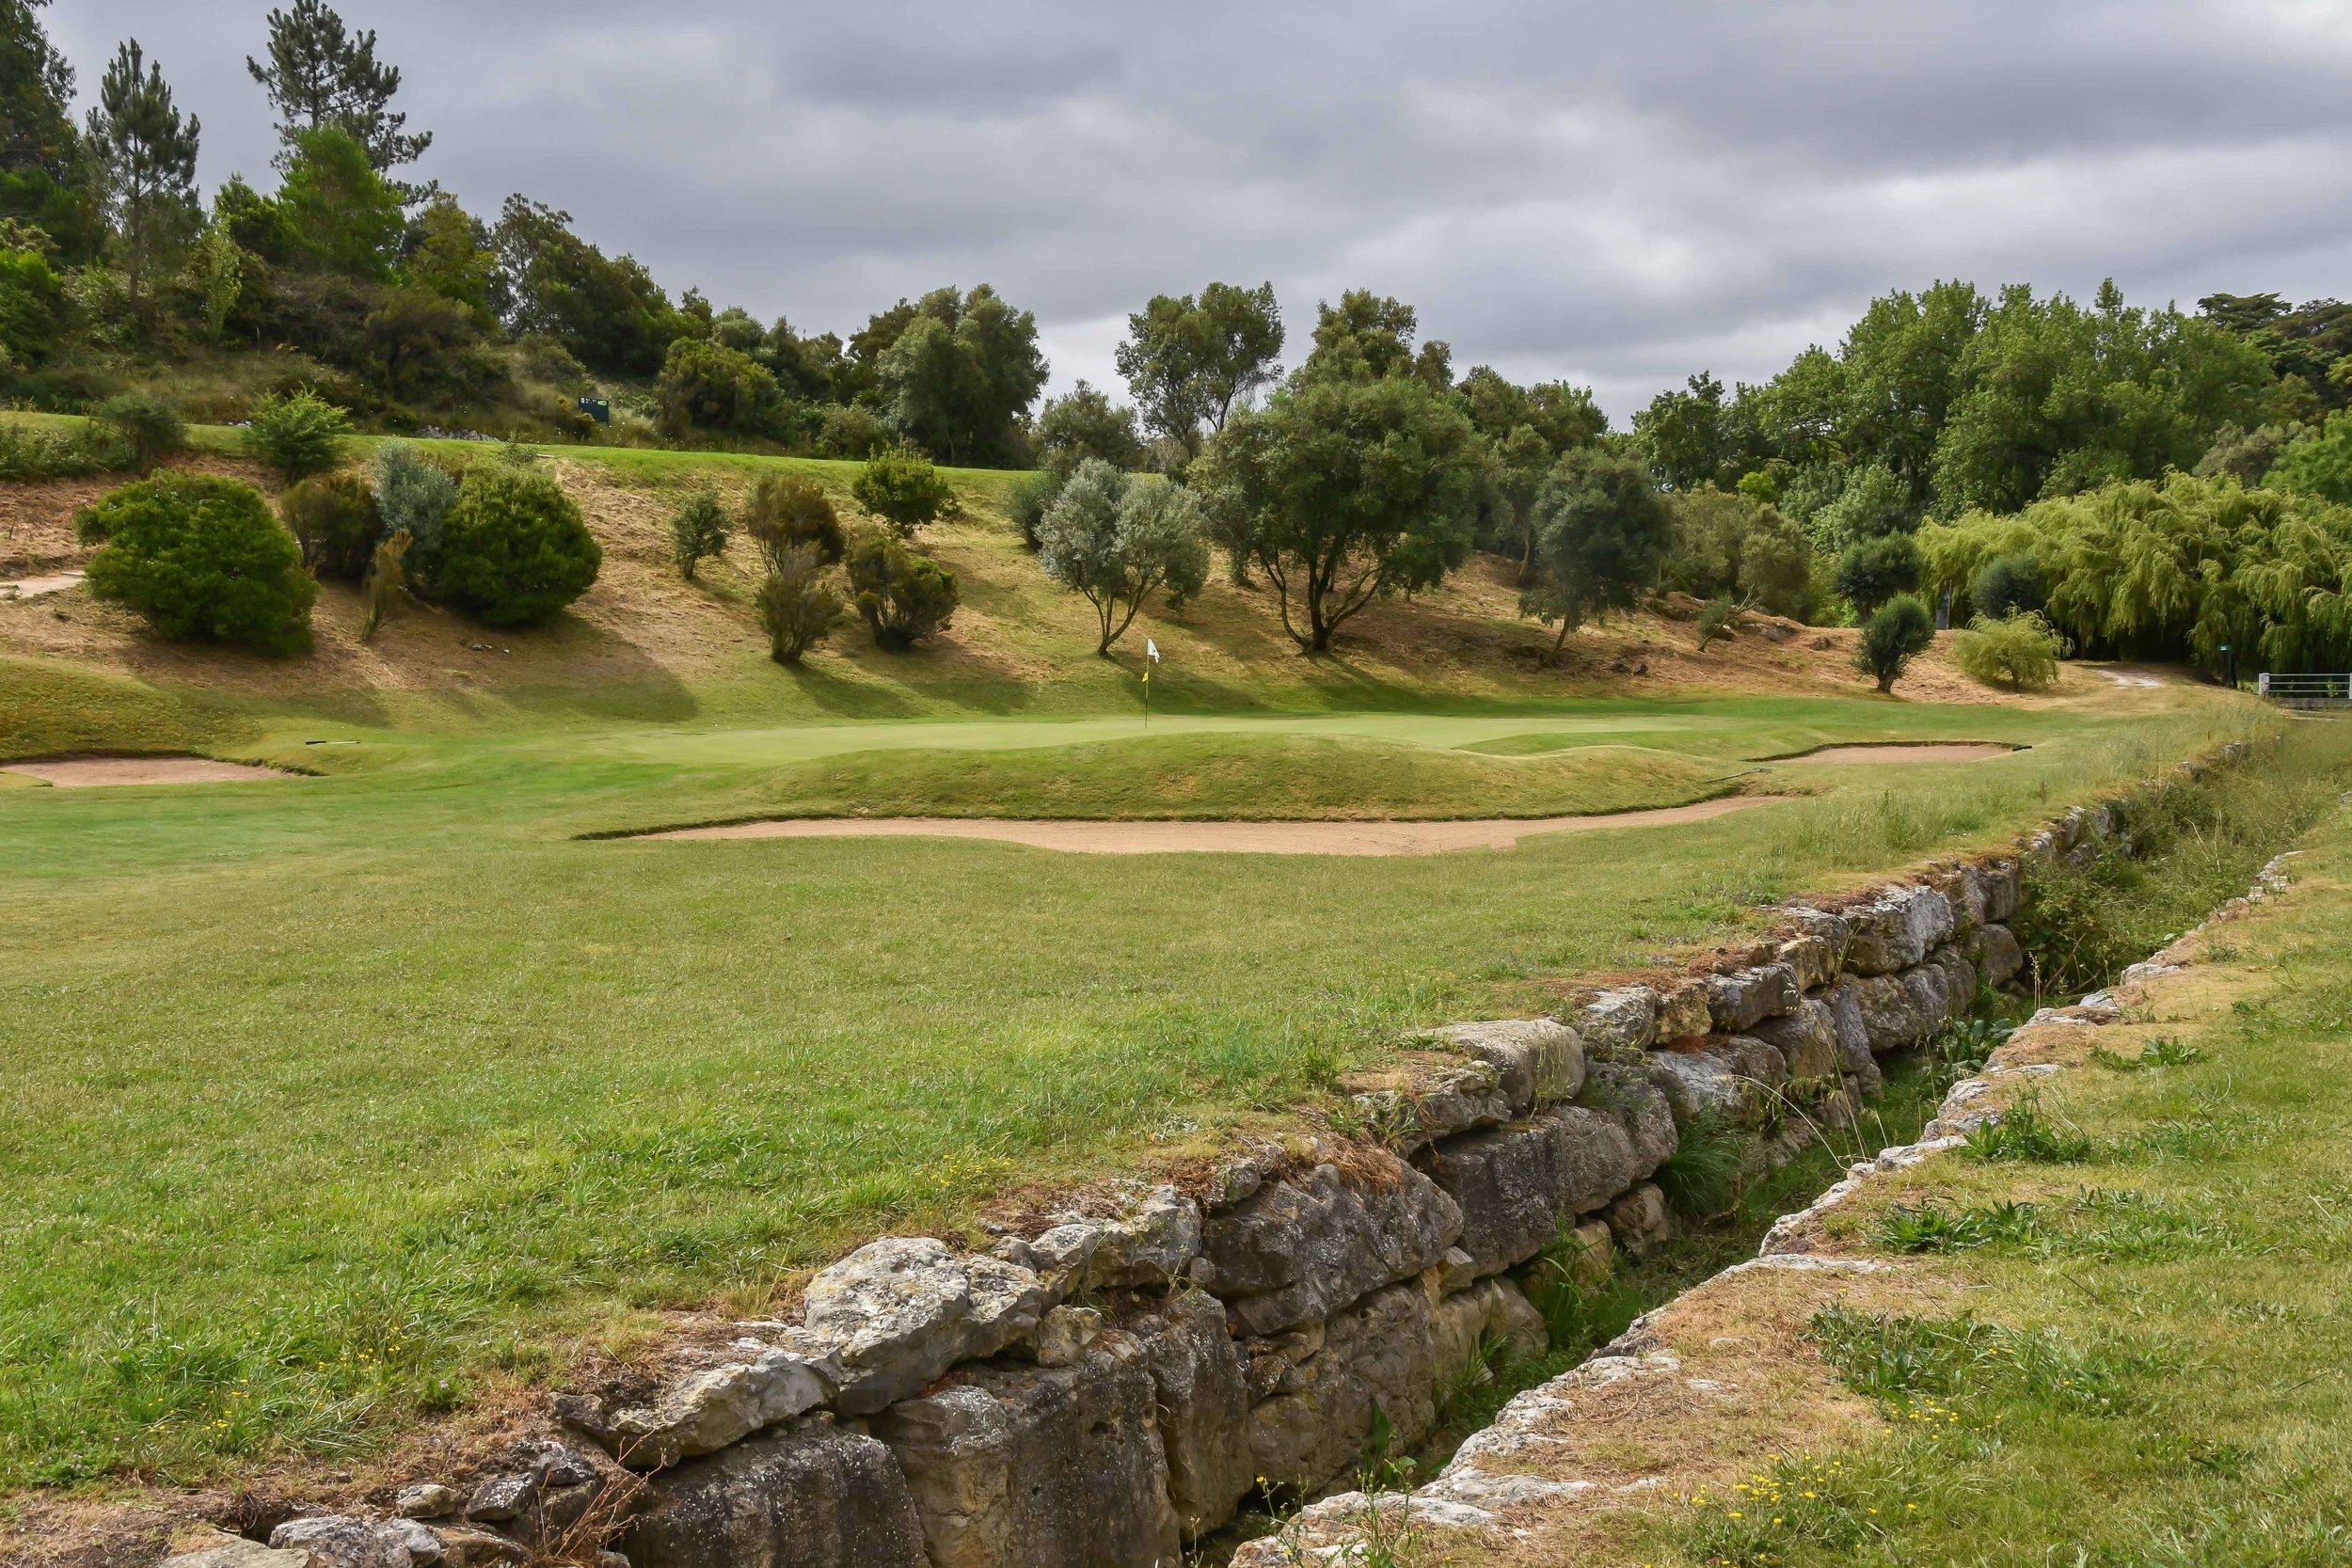 The golf moat at Lisbon Sports Club